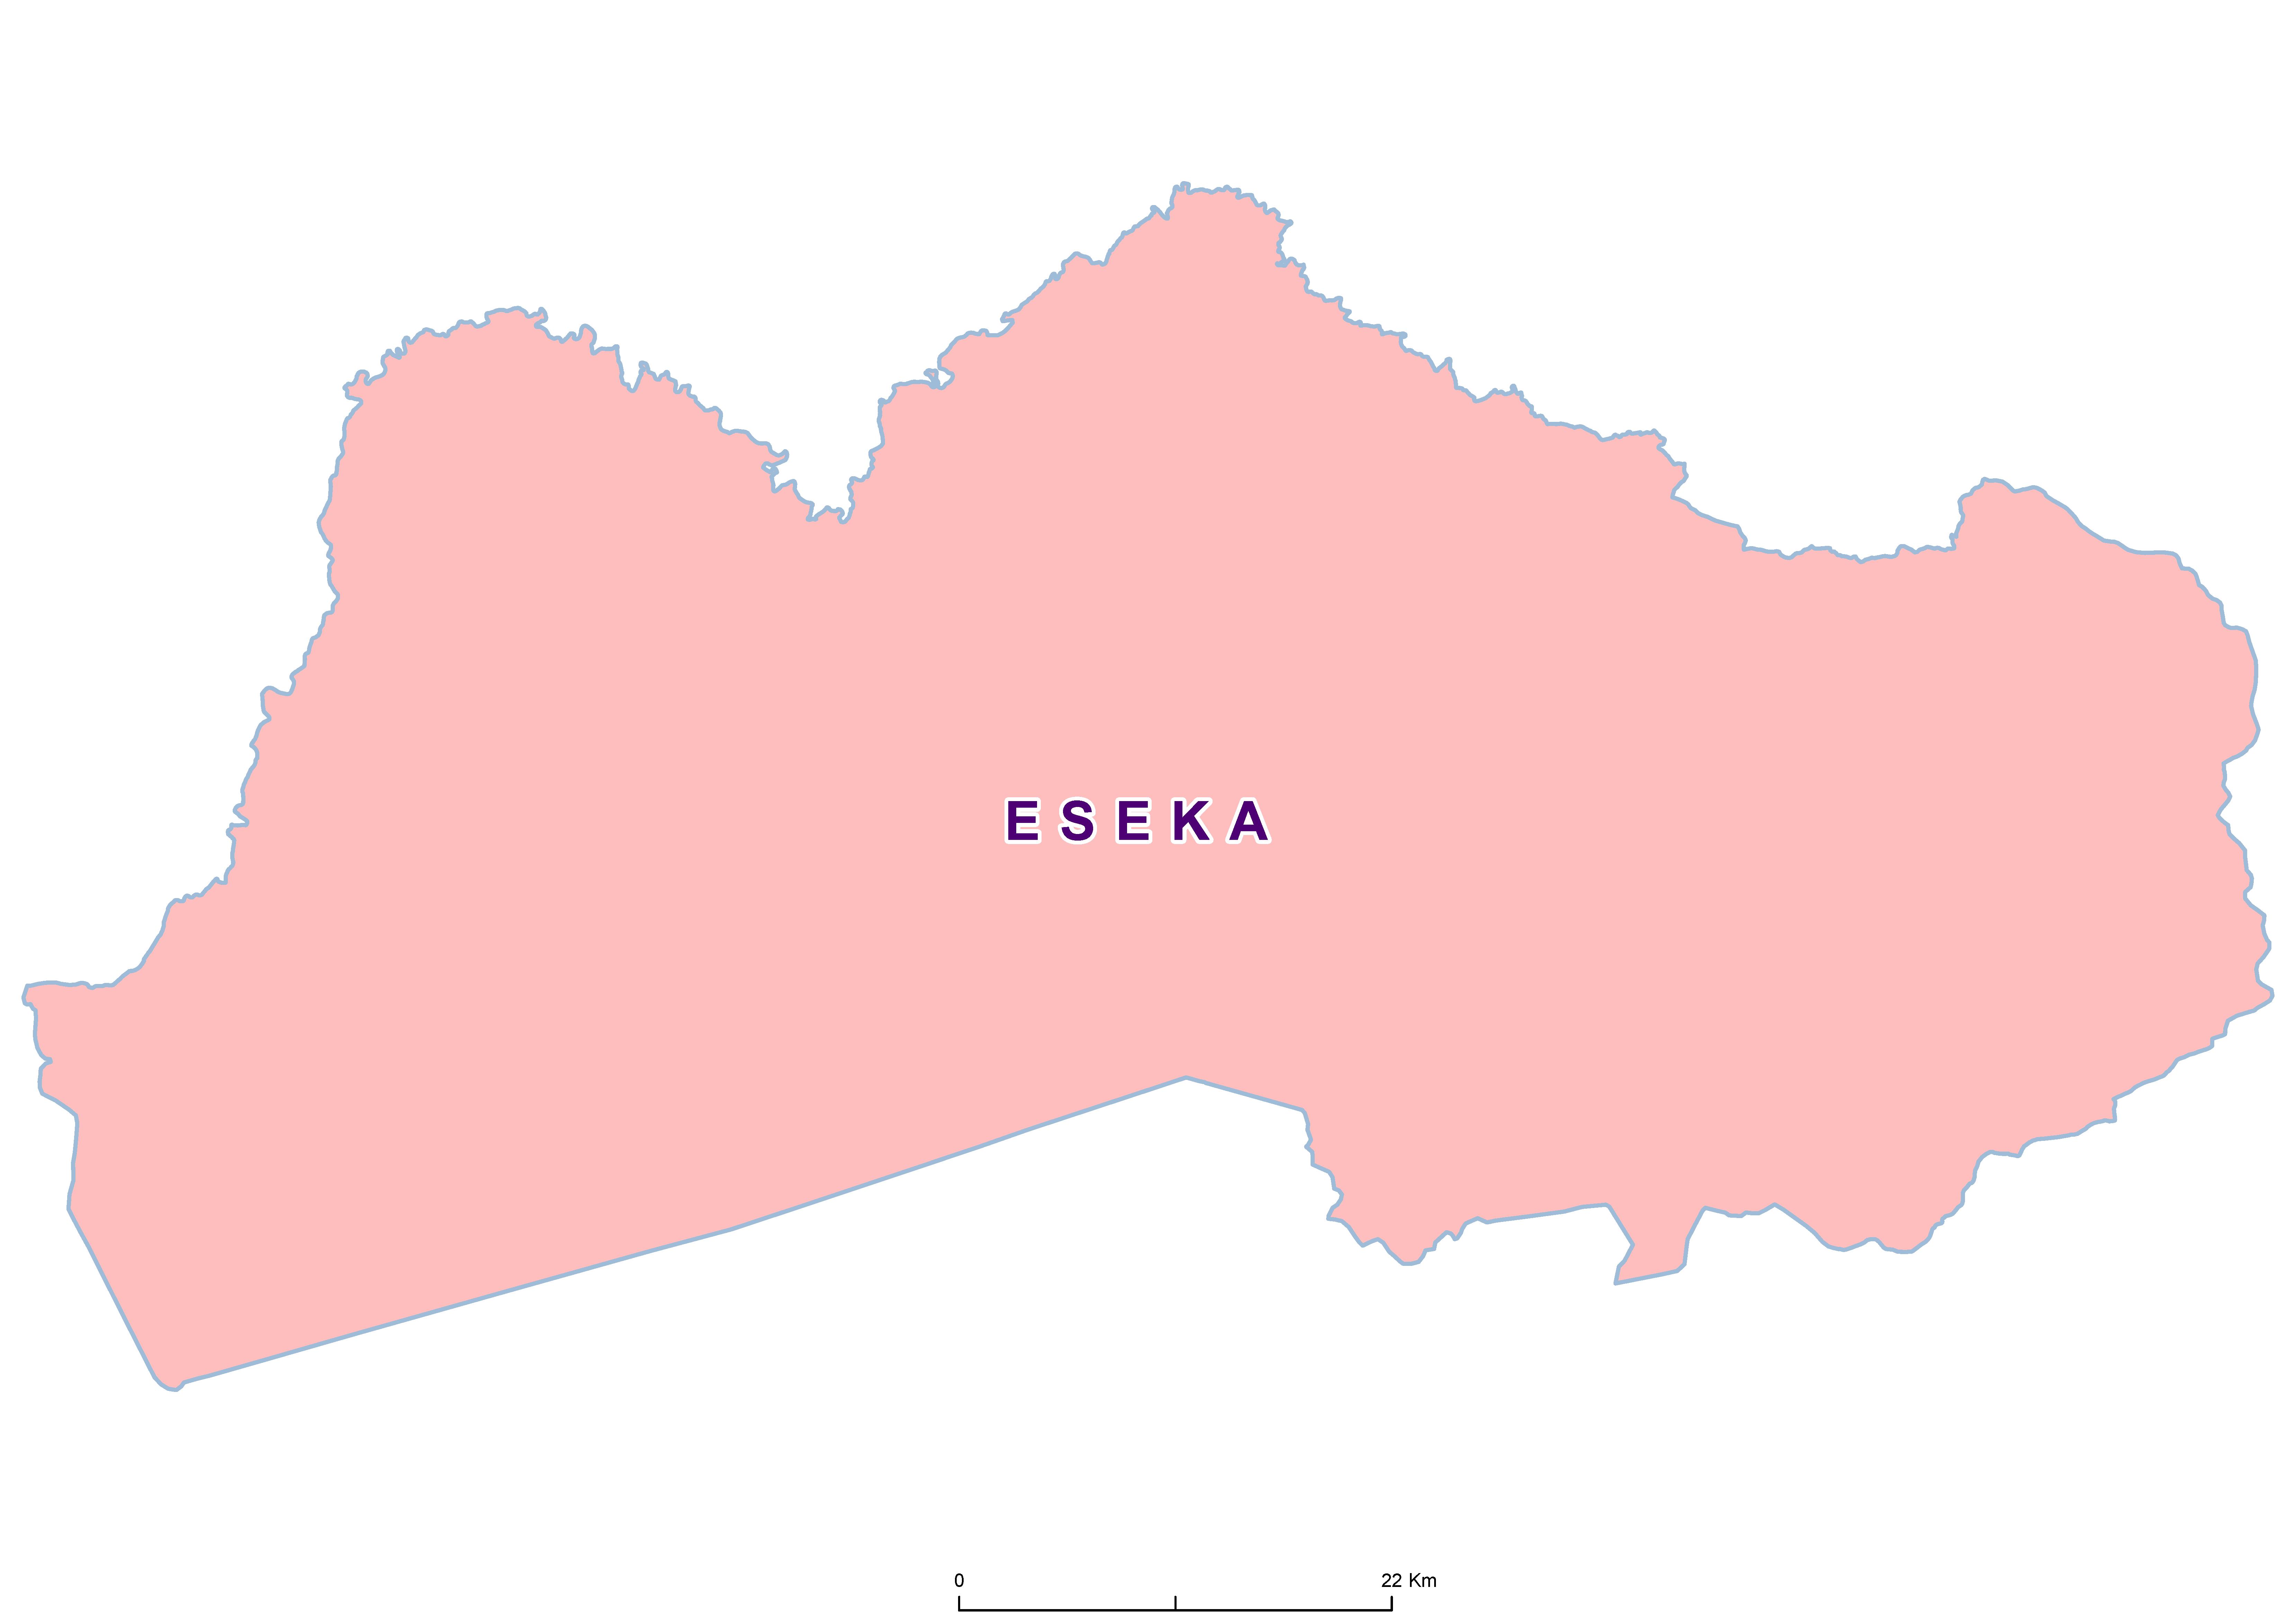 Eseka Mean STH 20100001